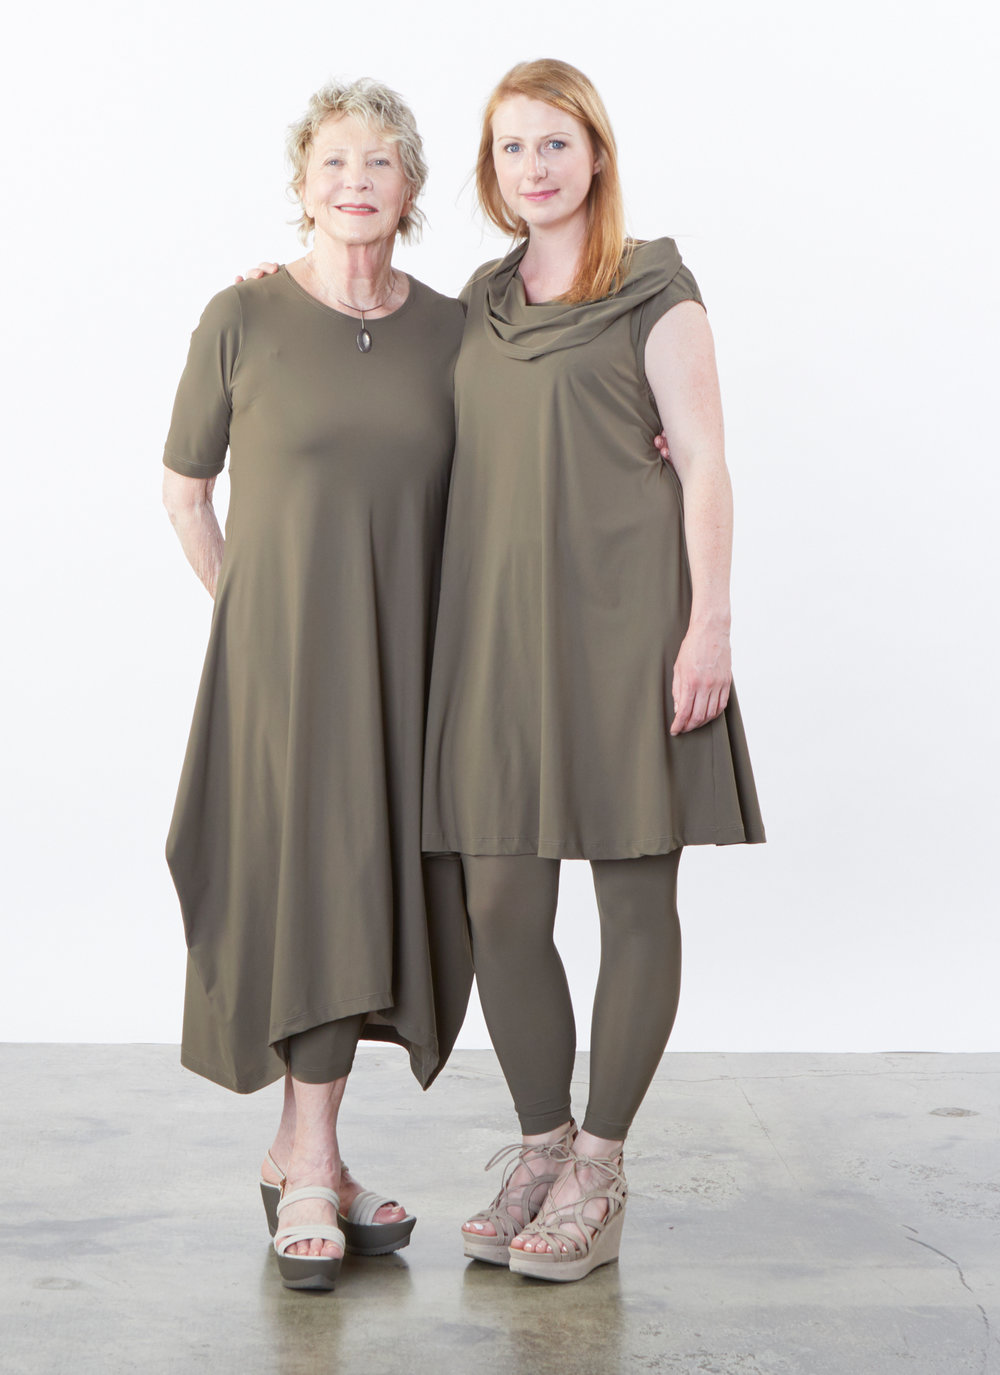 S/S Chelsea Dress, Nolan Tunic, Legging in Olive Microfiber Jersey